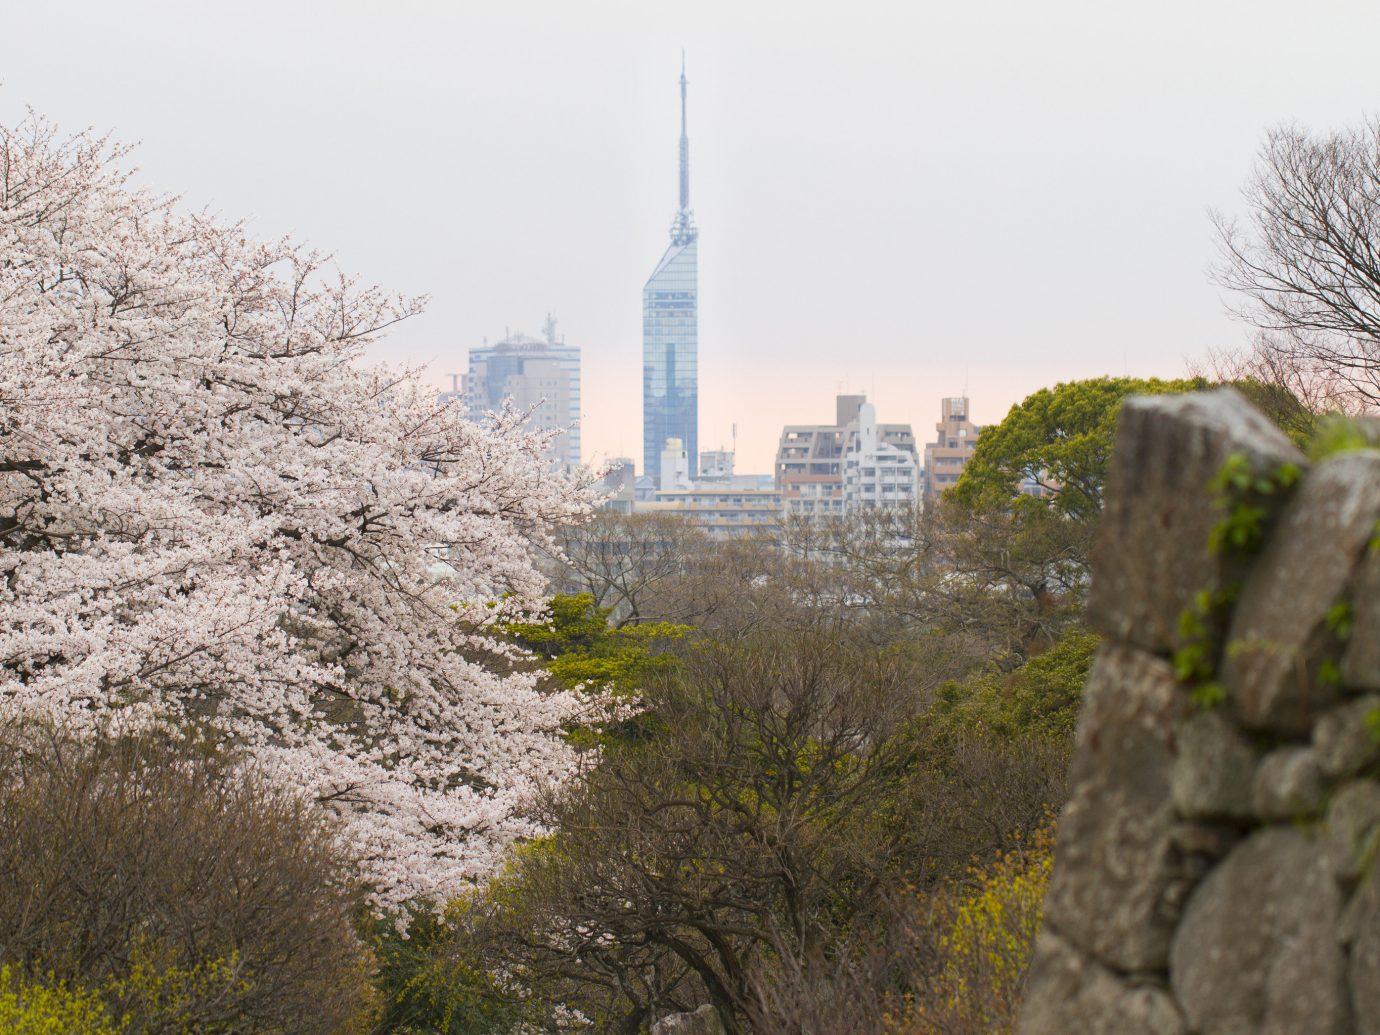 Japan Trip Ideas City plant urban area tree flower sky leaf cherry blossom skyline daytime spring skyscraper building metropolitan area Downtown landscape